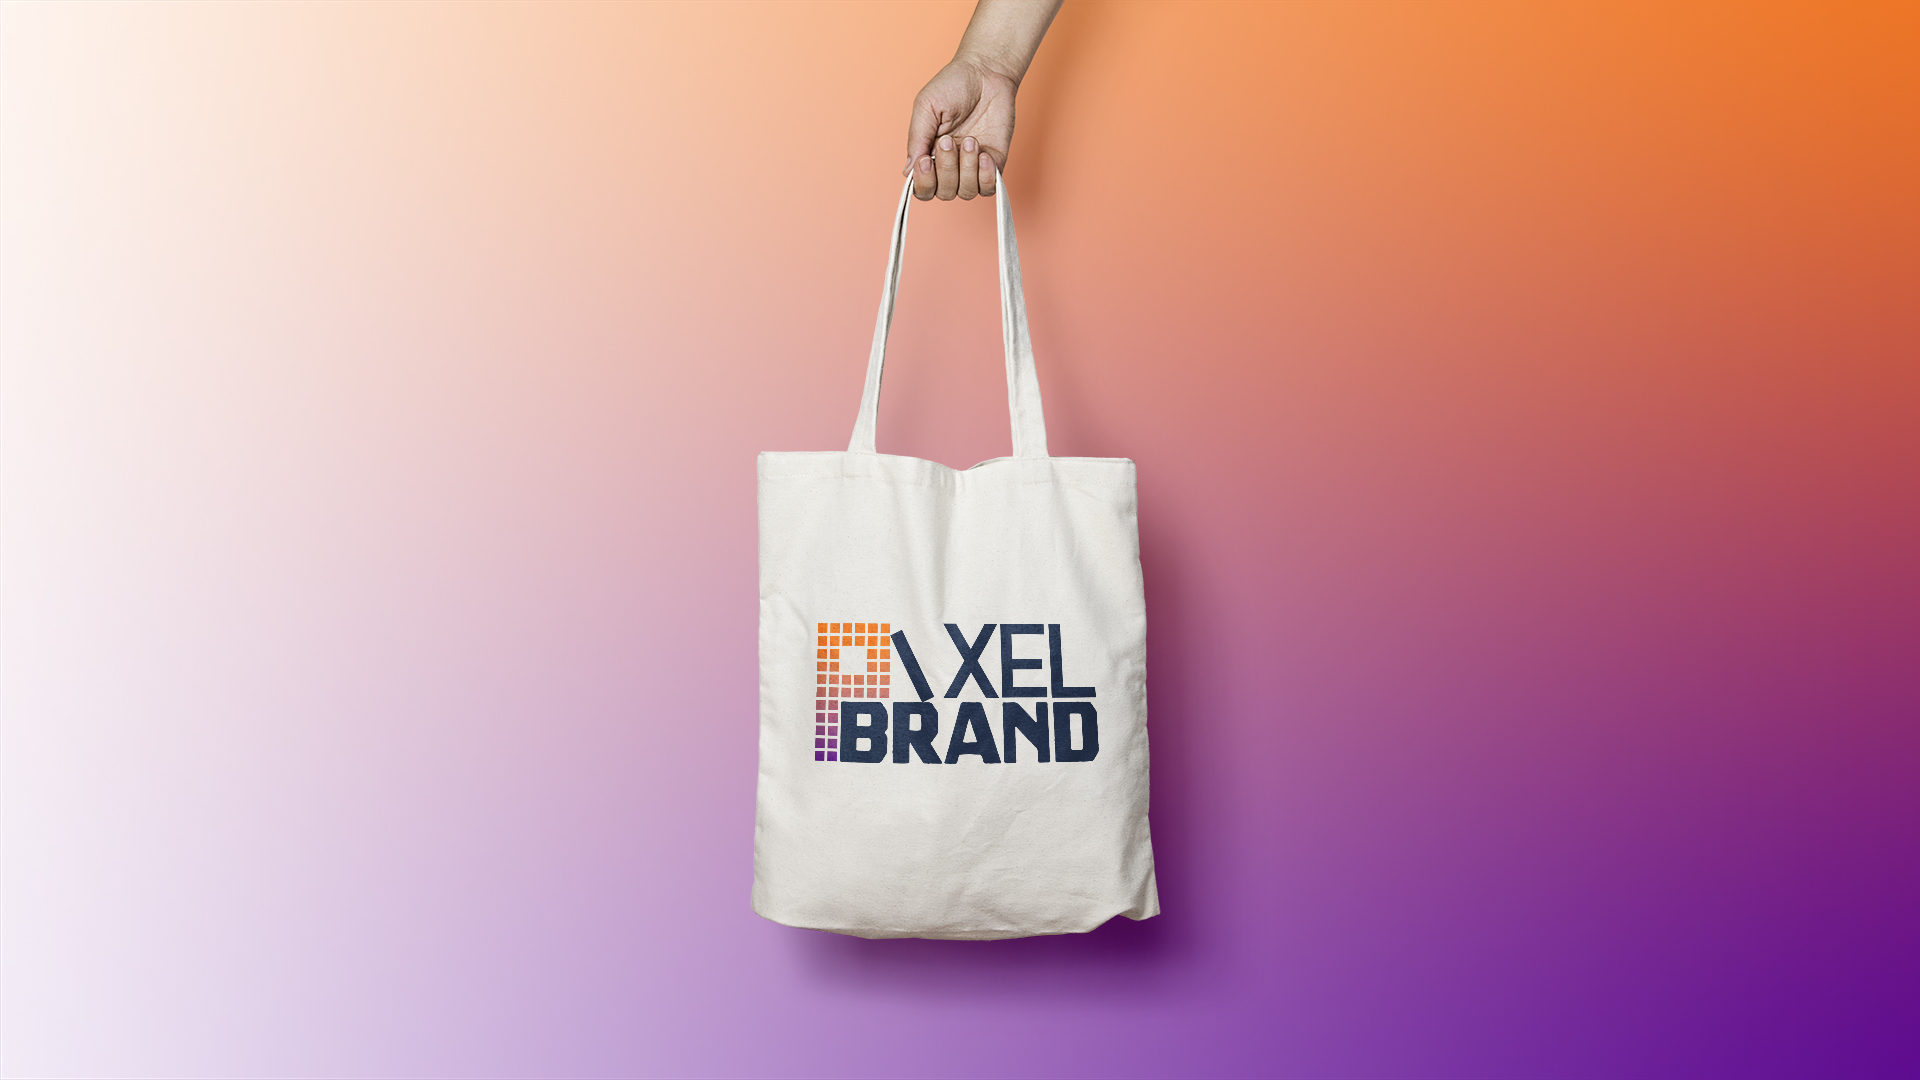 Pixel Brand's toto bag